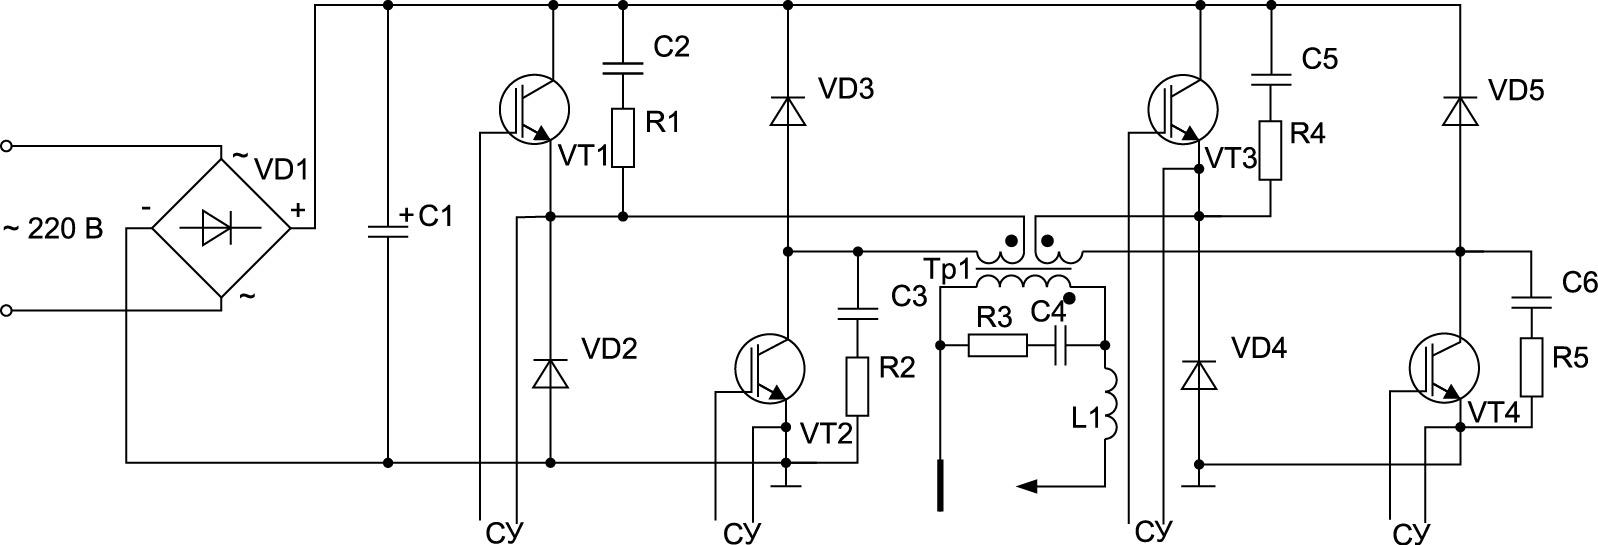 Схема инверторного сварочного аппарата знакопеременного тока